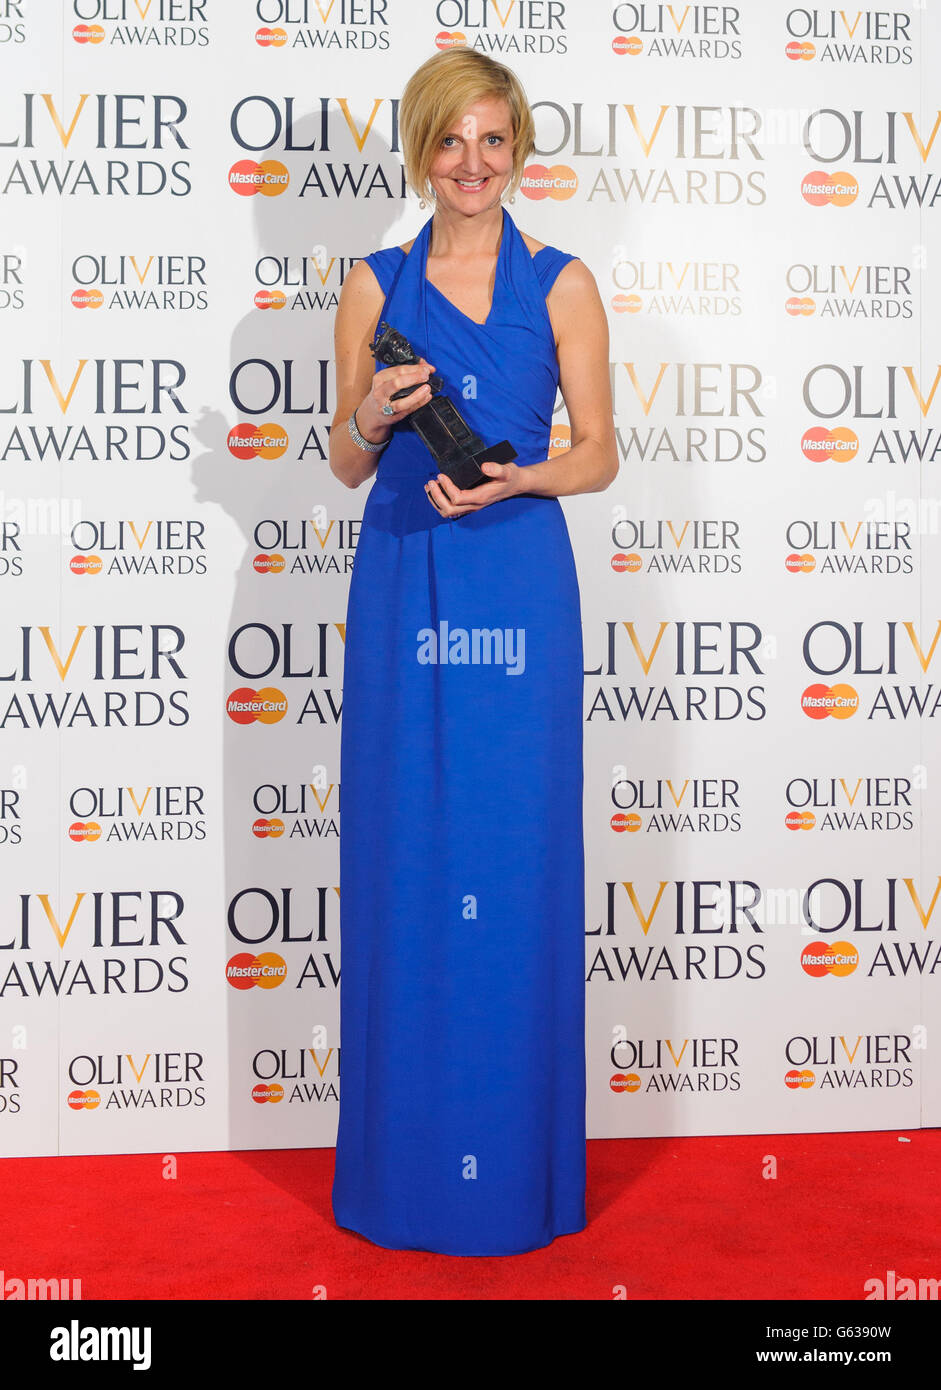 Olivier Awards 2013 Press Room - London - Stock Image